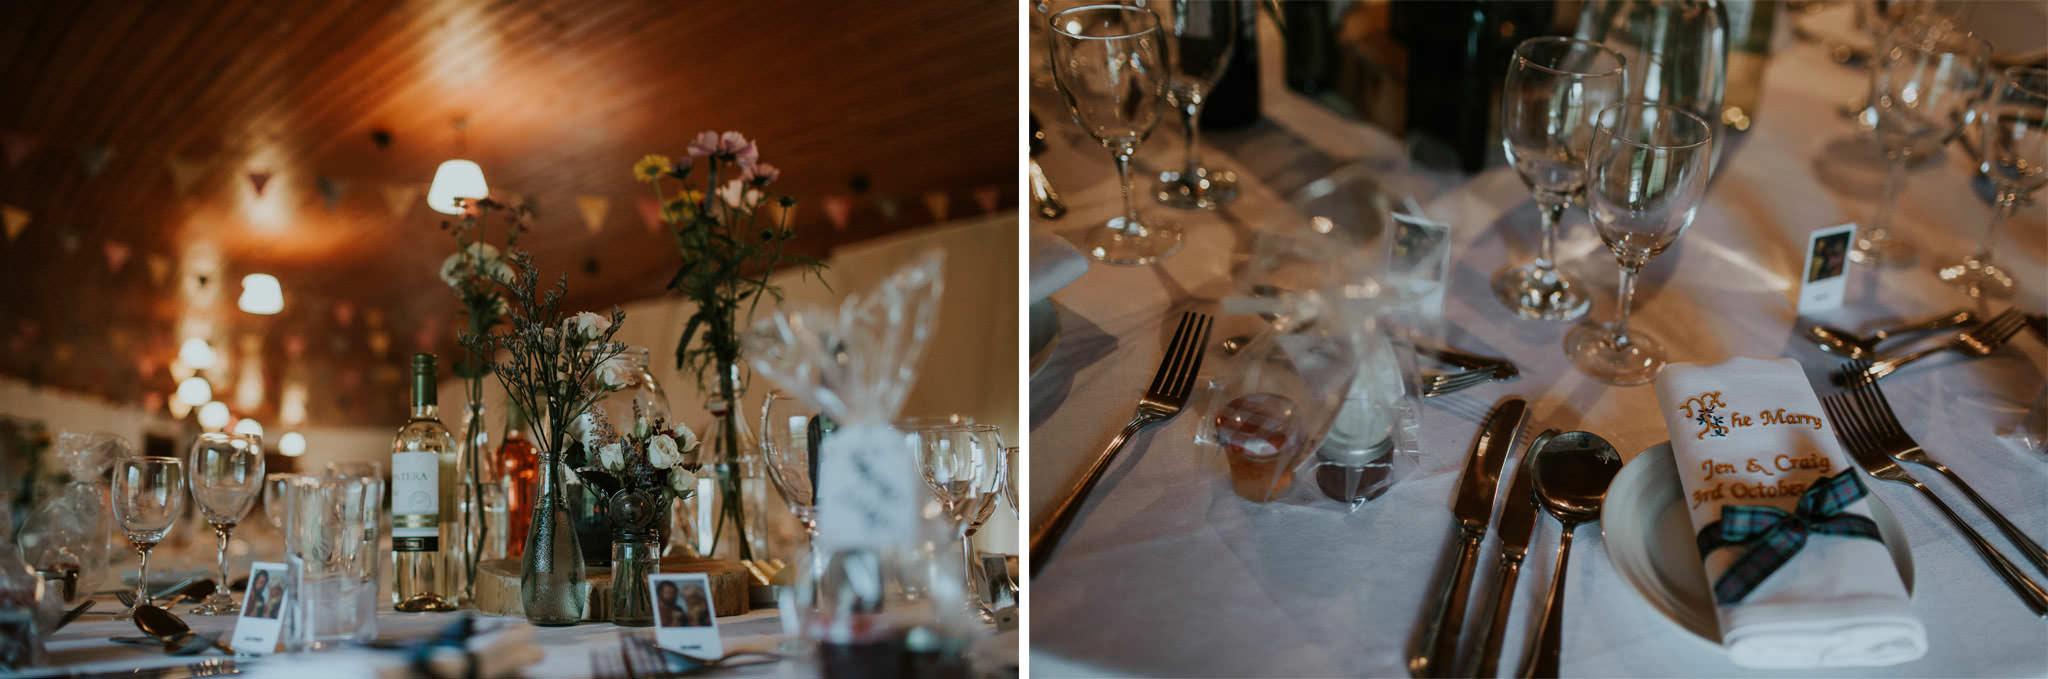 fine-art-wedding-photography-scotland 094